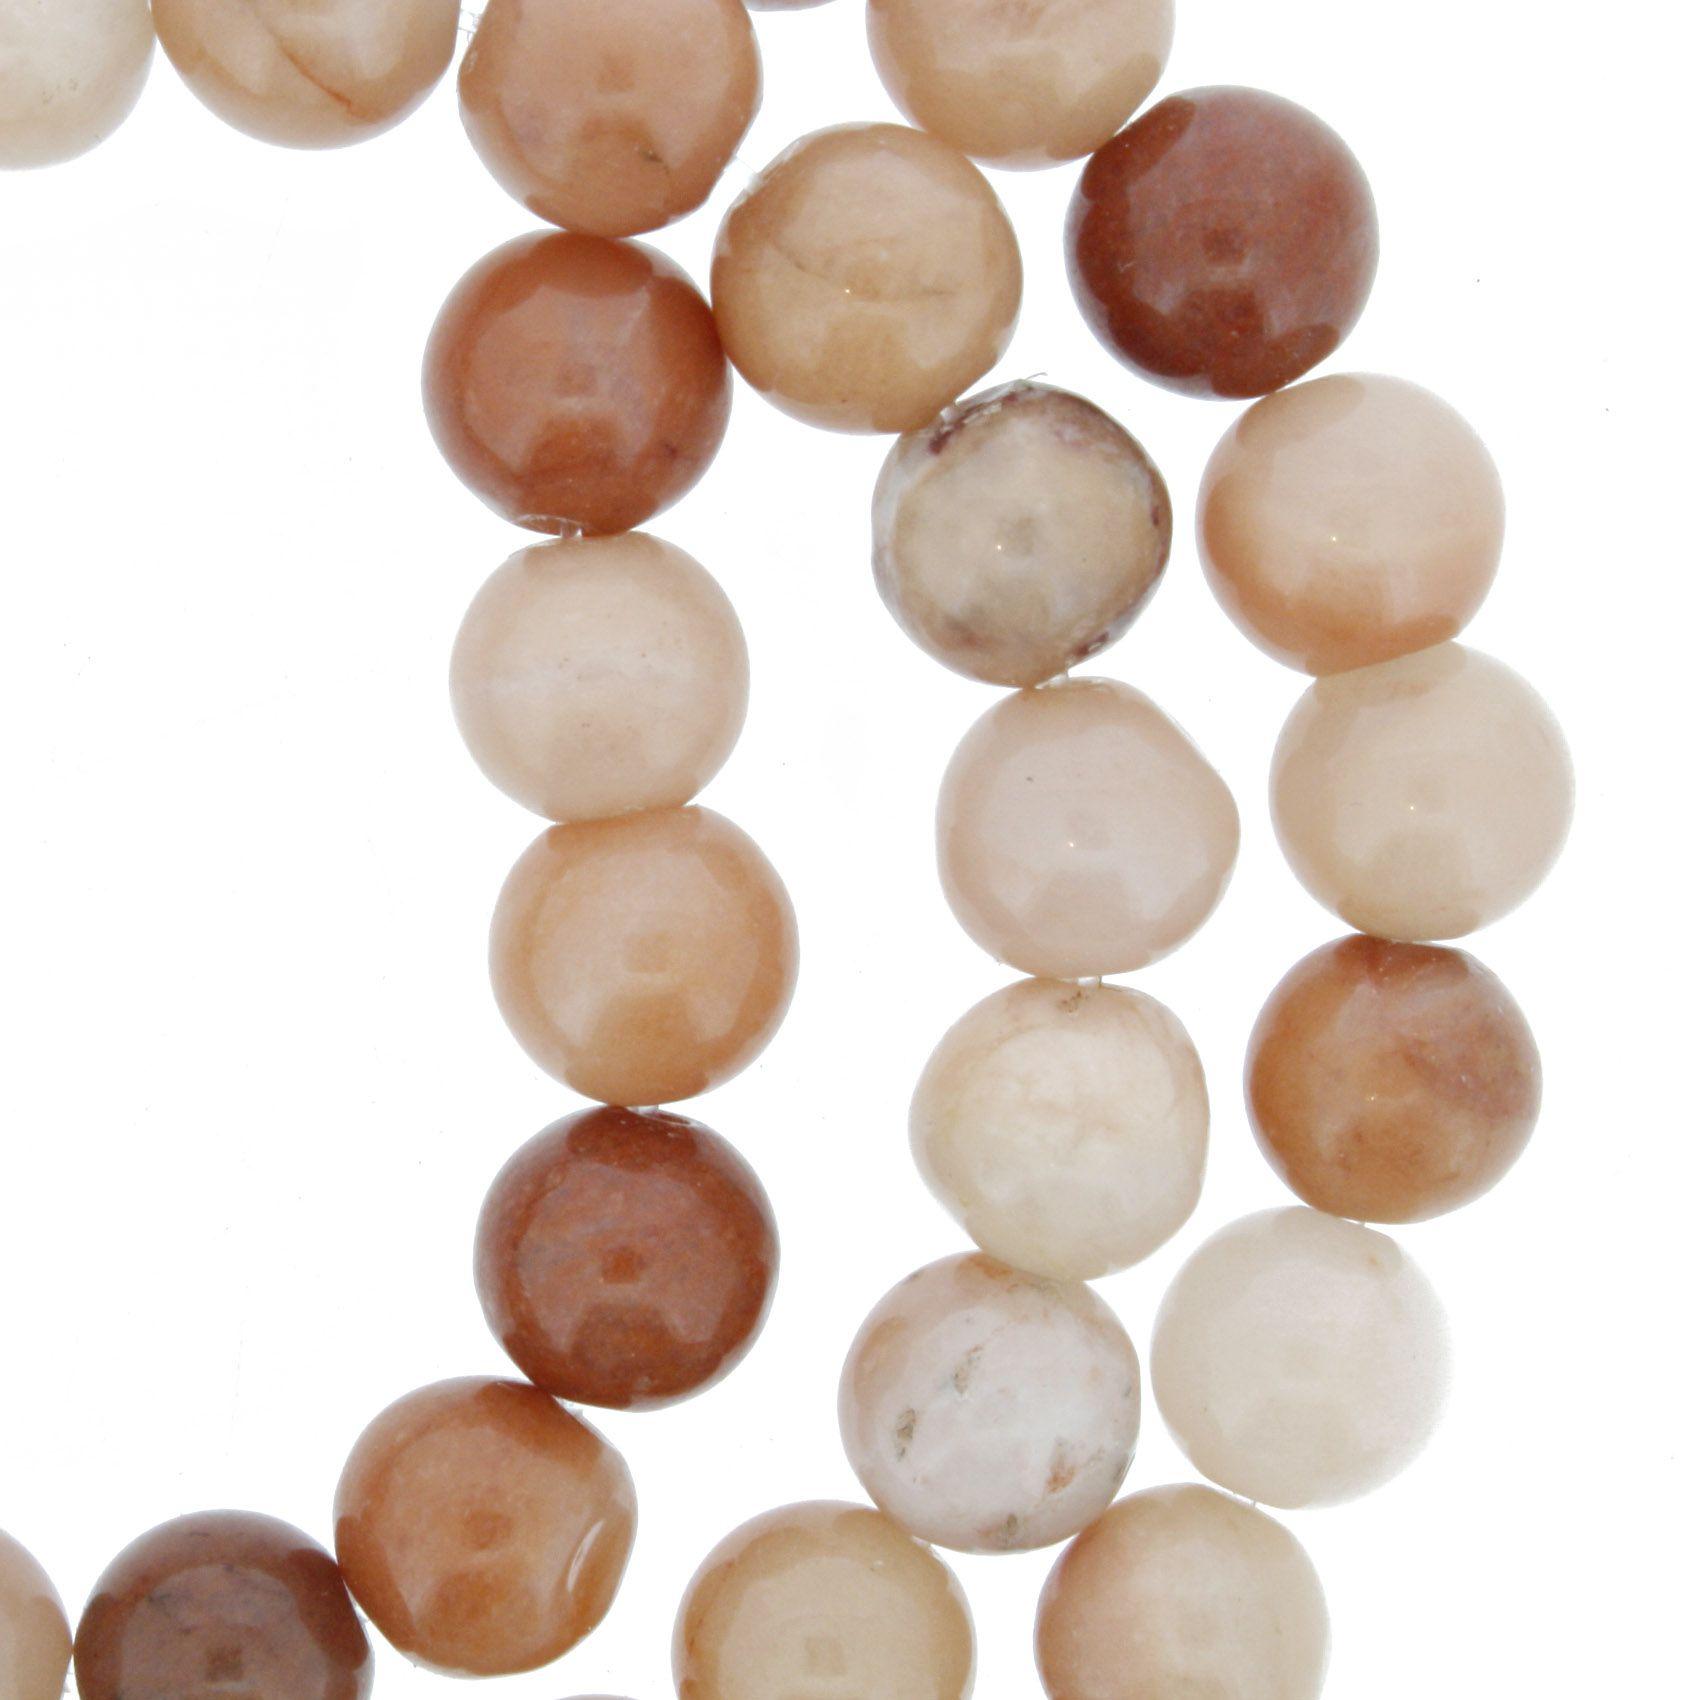 Fio de Pedra - Jaspe Pêssego - 8mm  - Stéphanie Bijoux® - Peças para Bijuterias e Artesanato